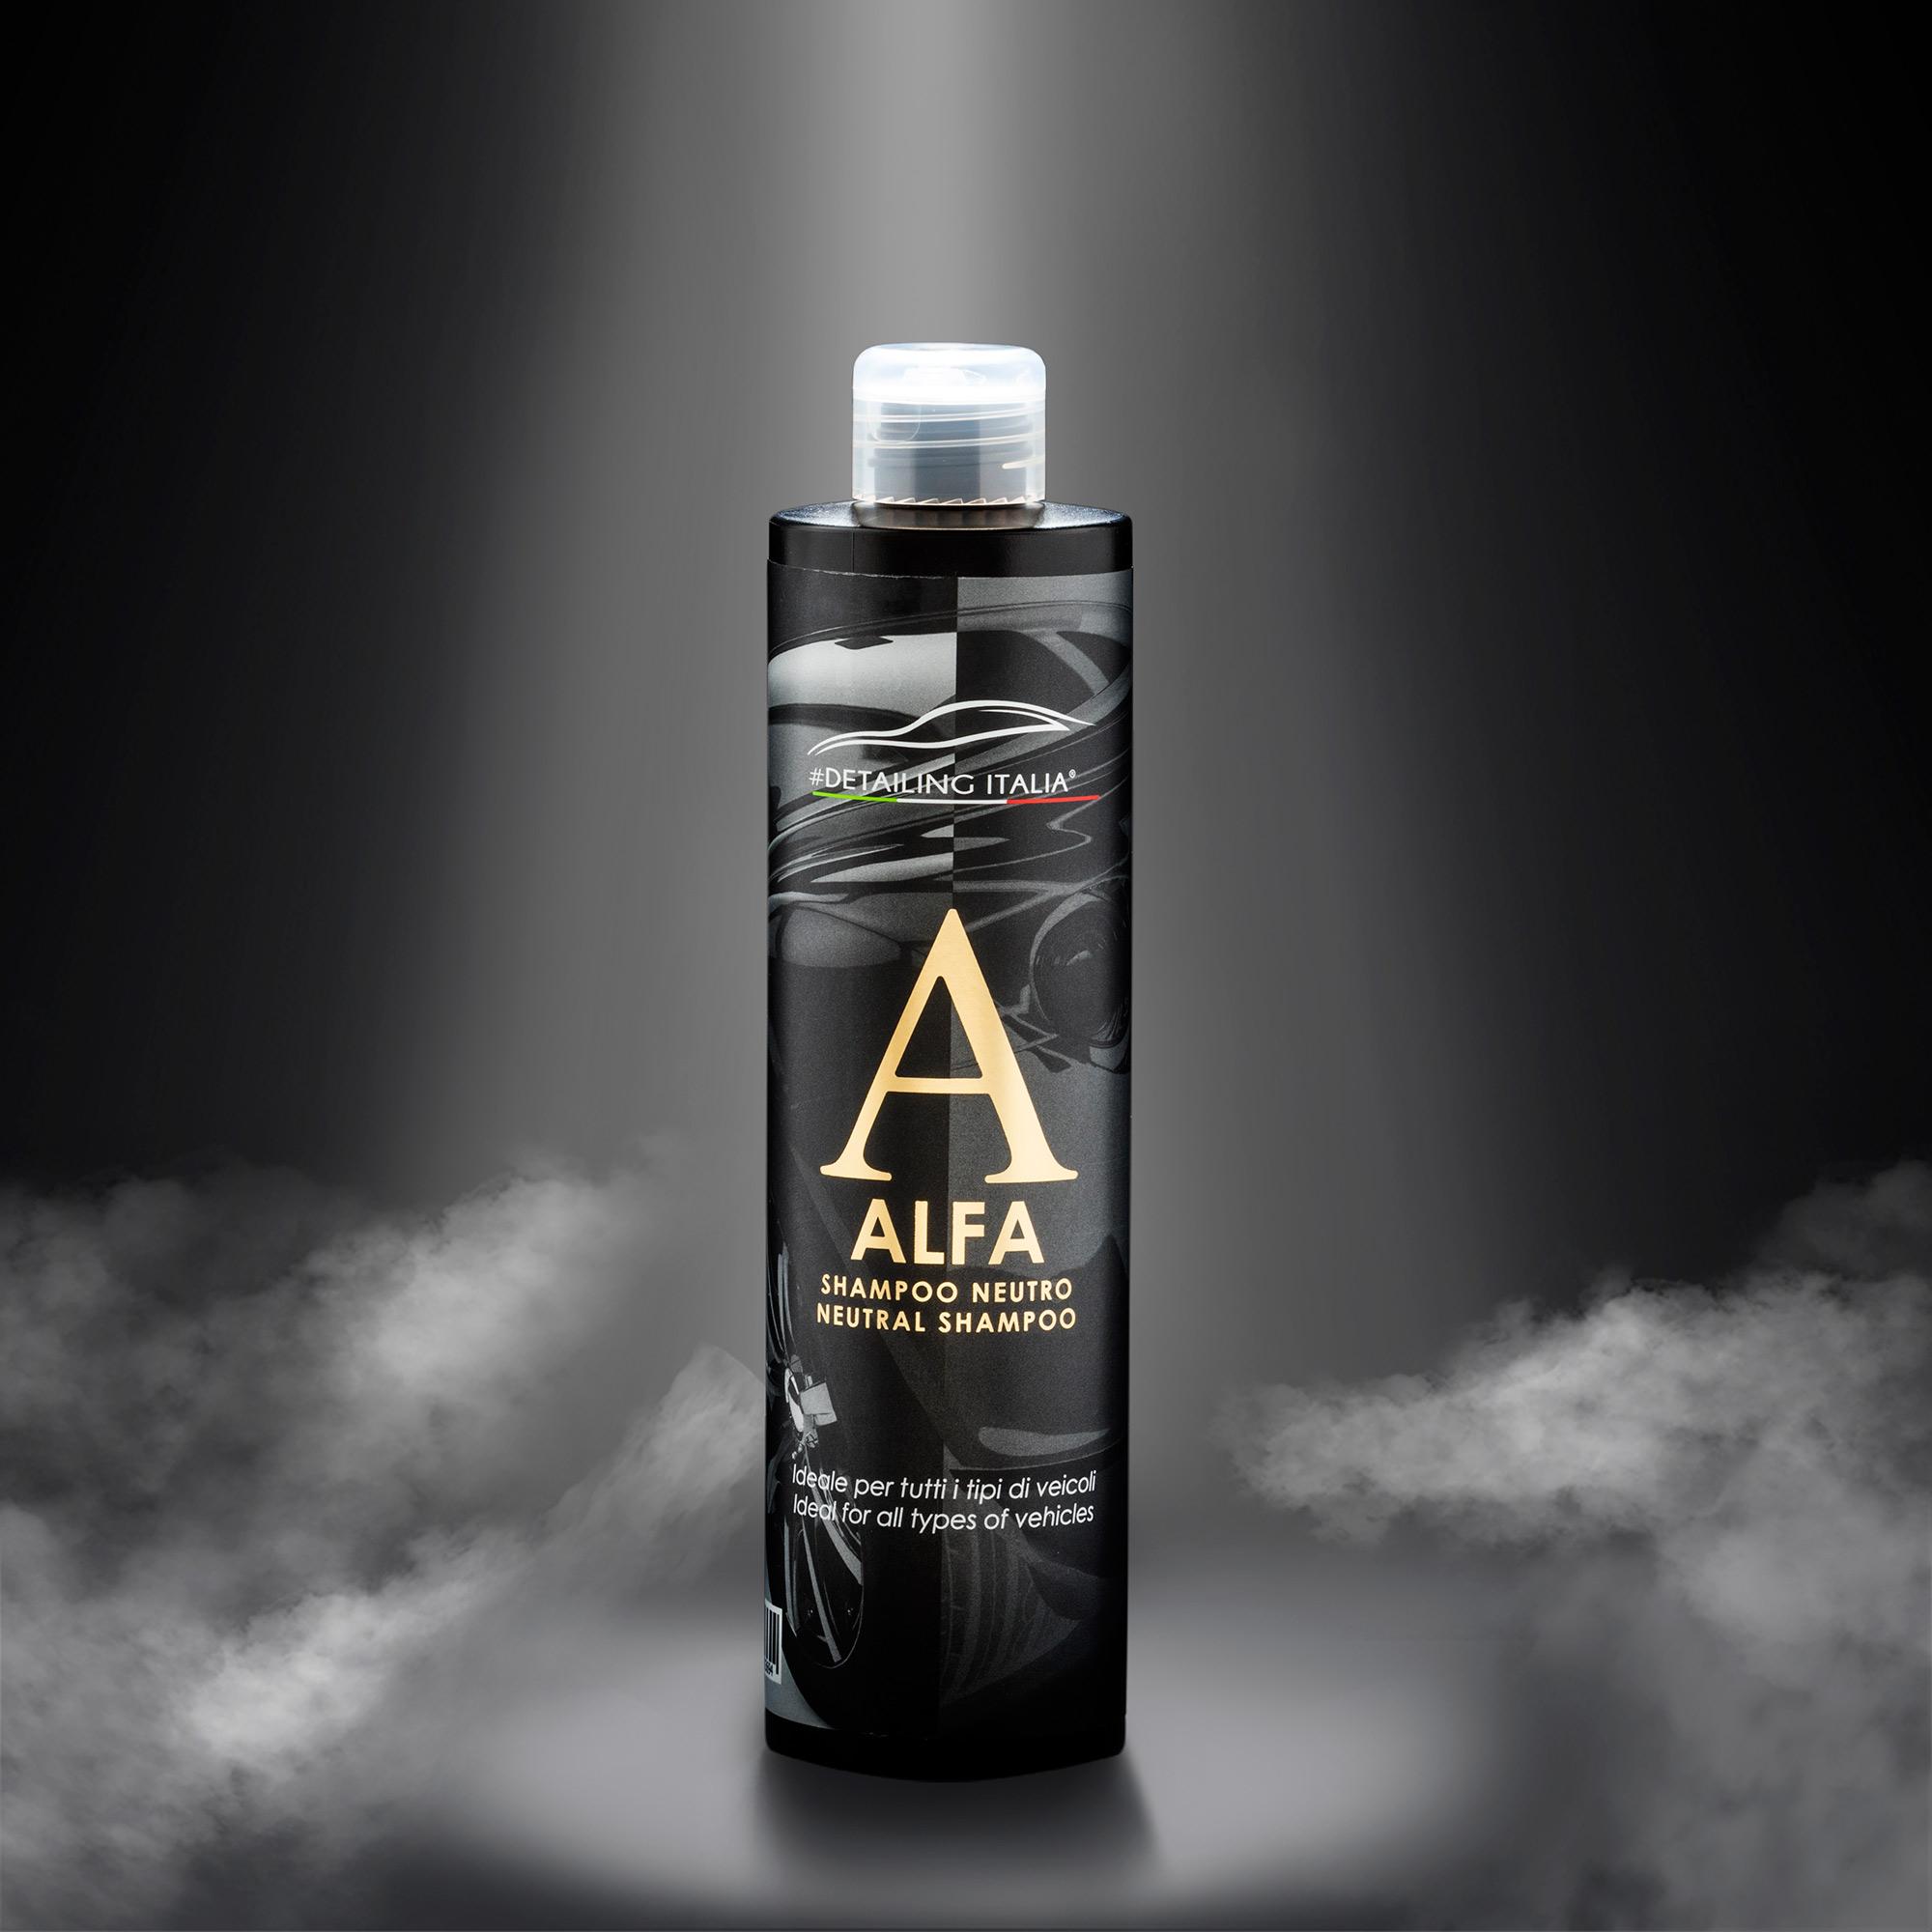 Alfa-Shampoo-neutro-per-auto